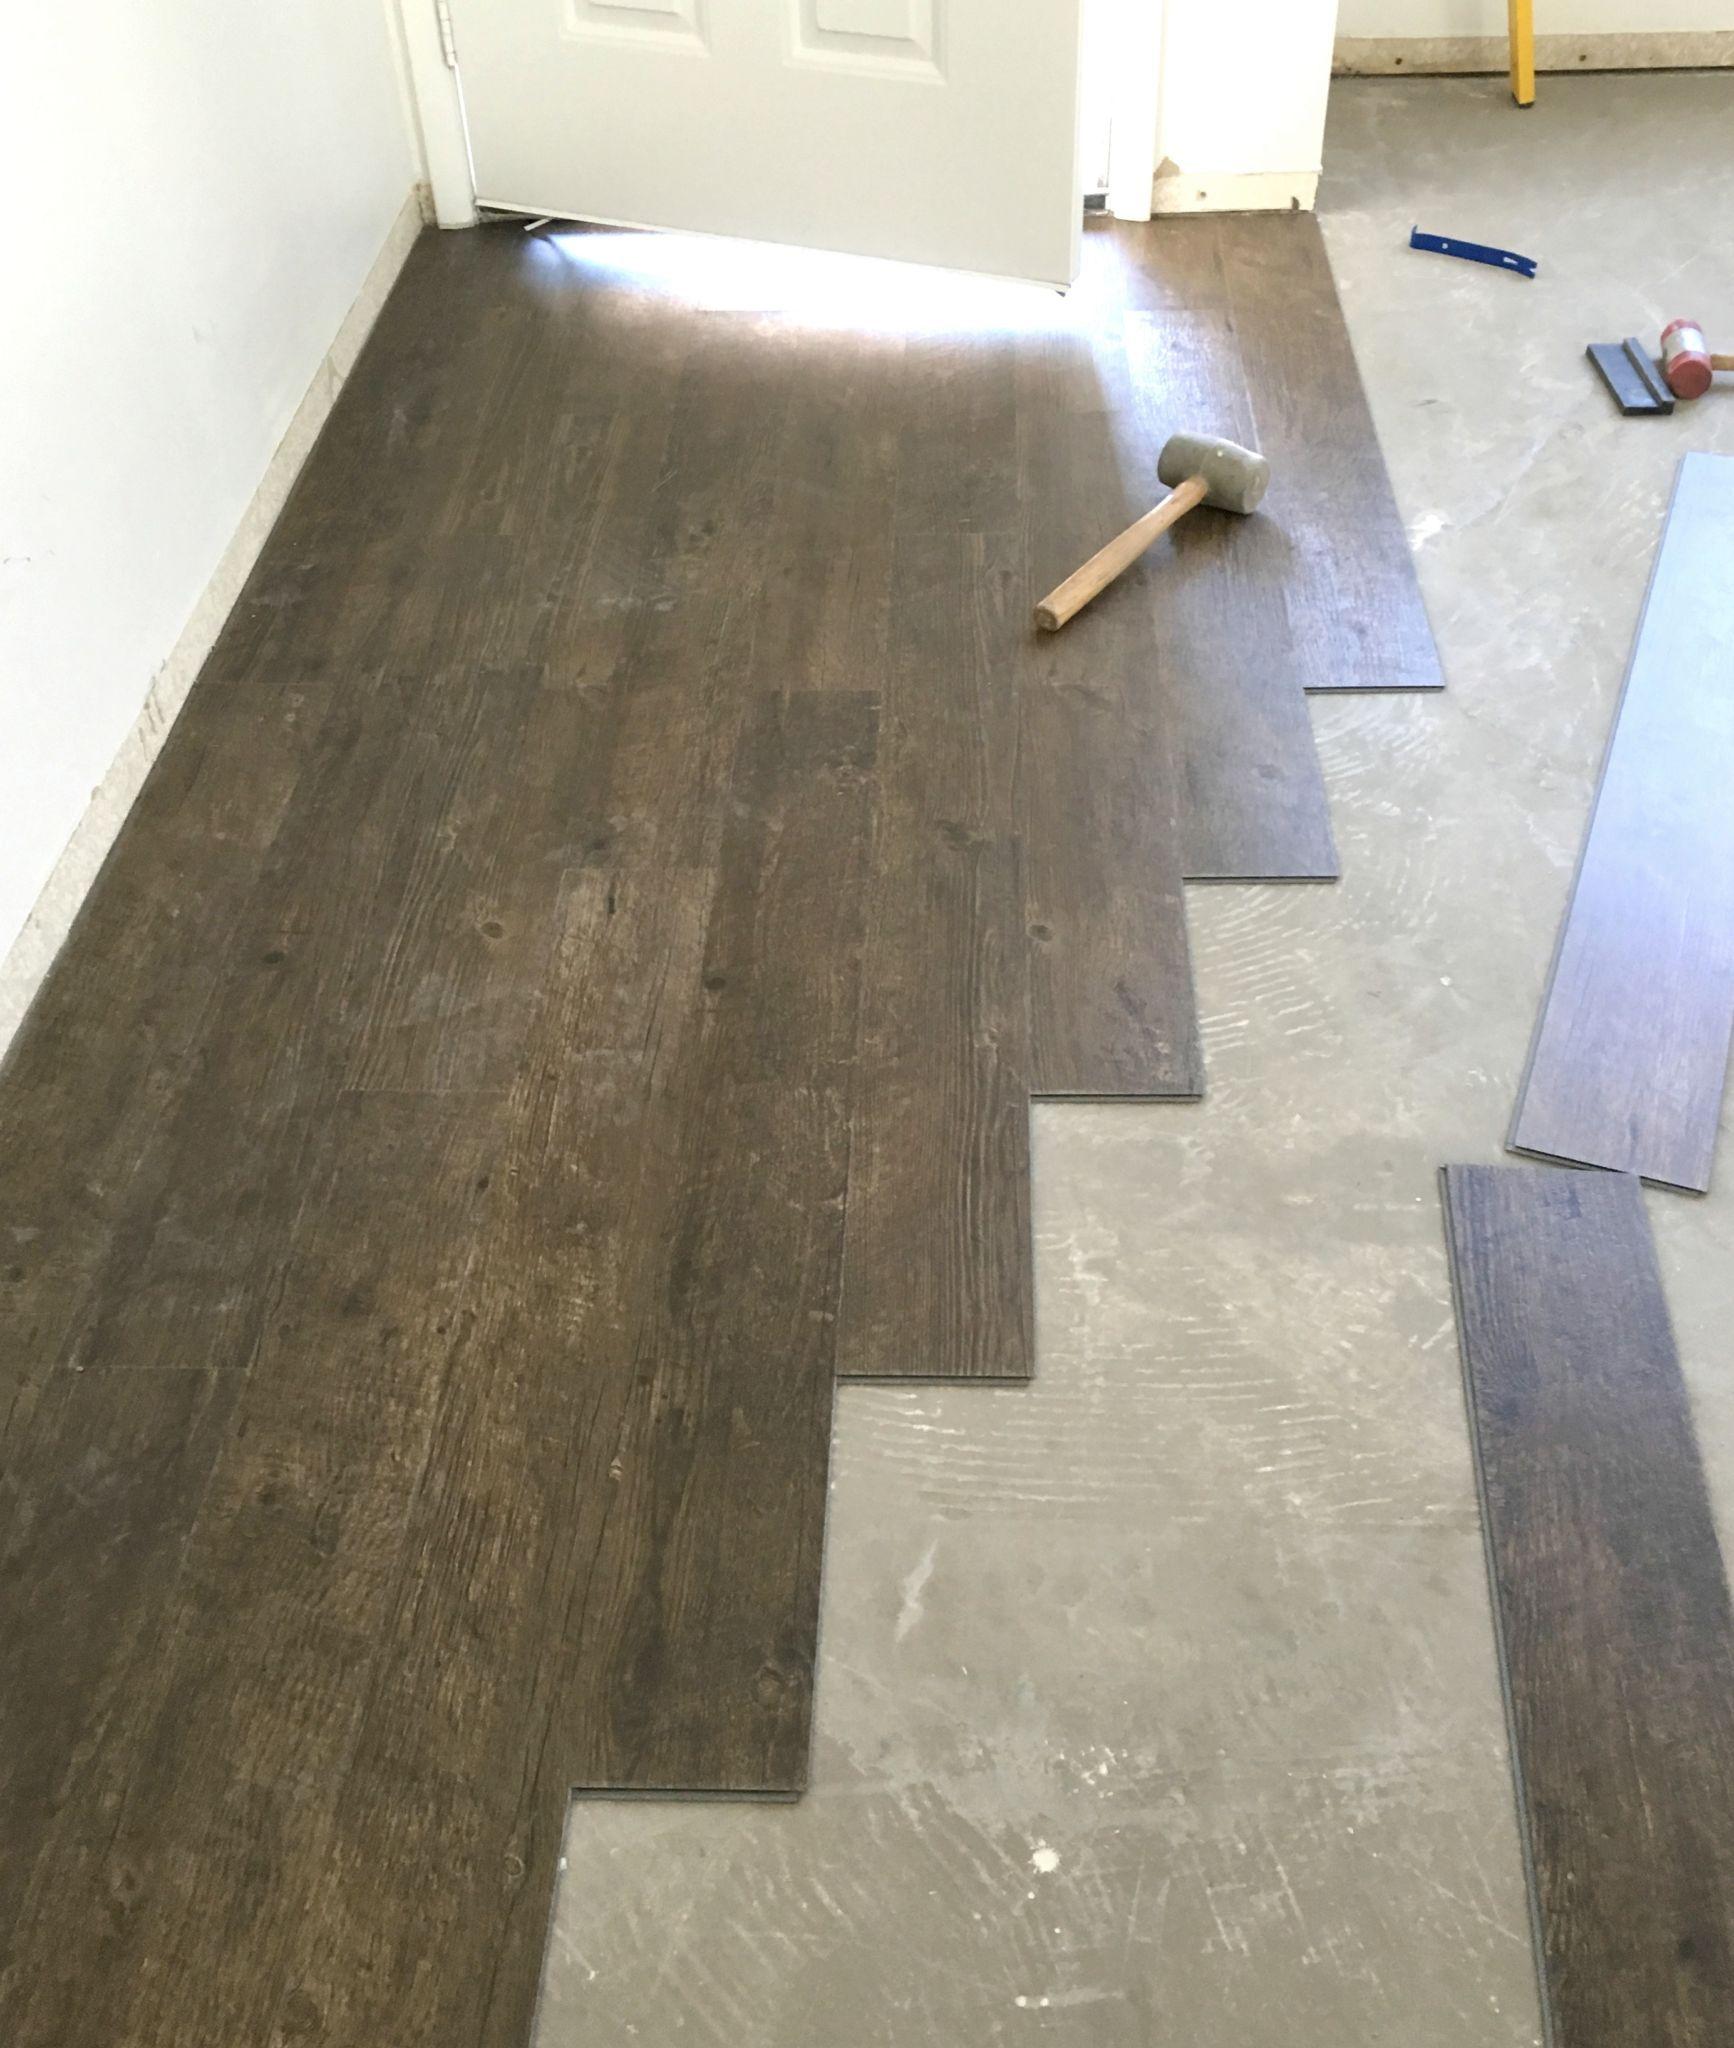 Vinyl Plank Flooring Prep & Installation Waterproof